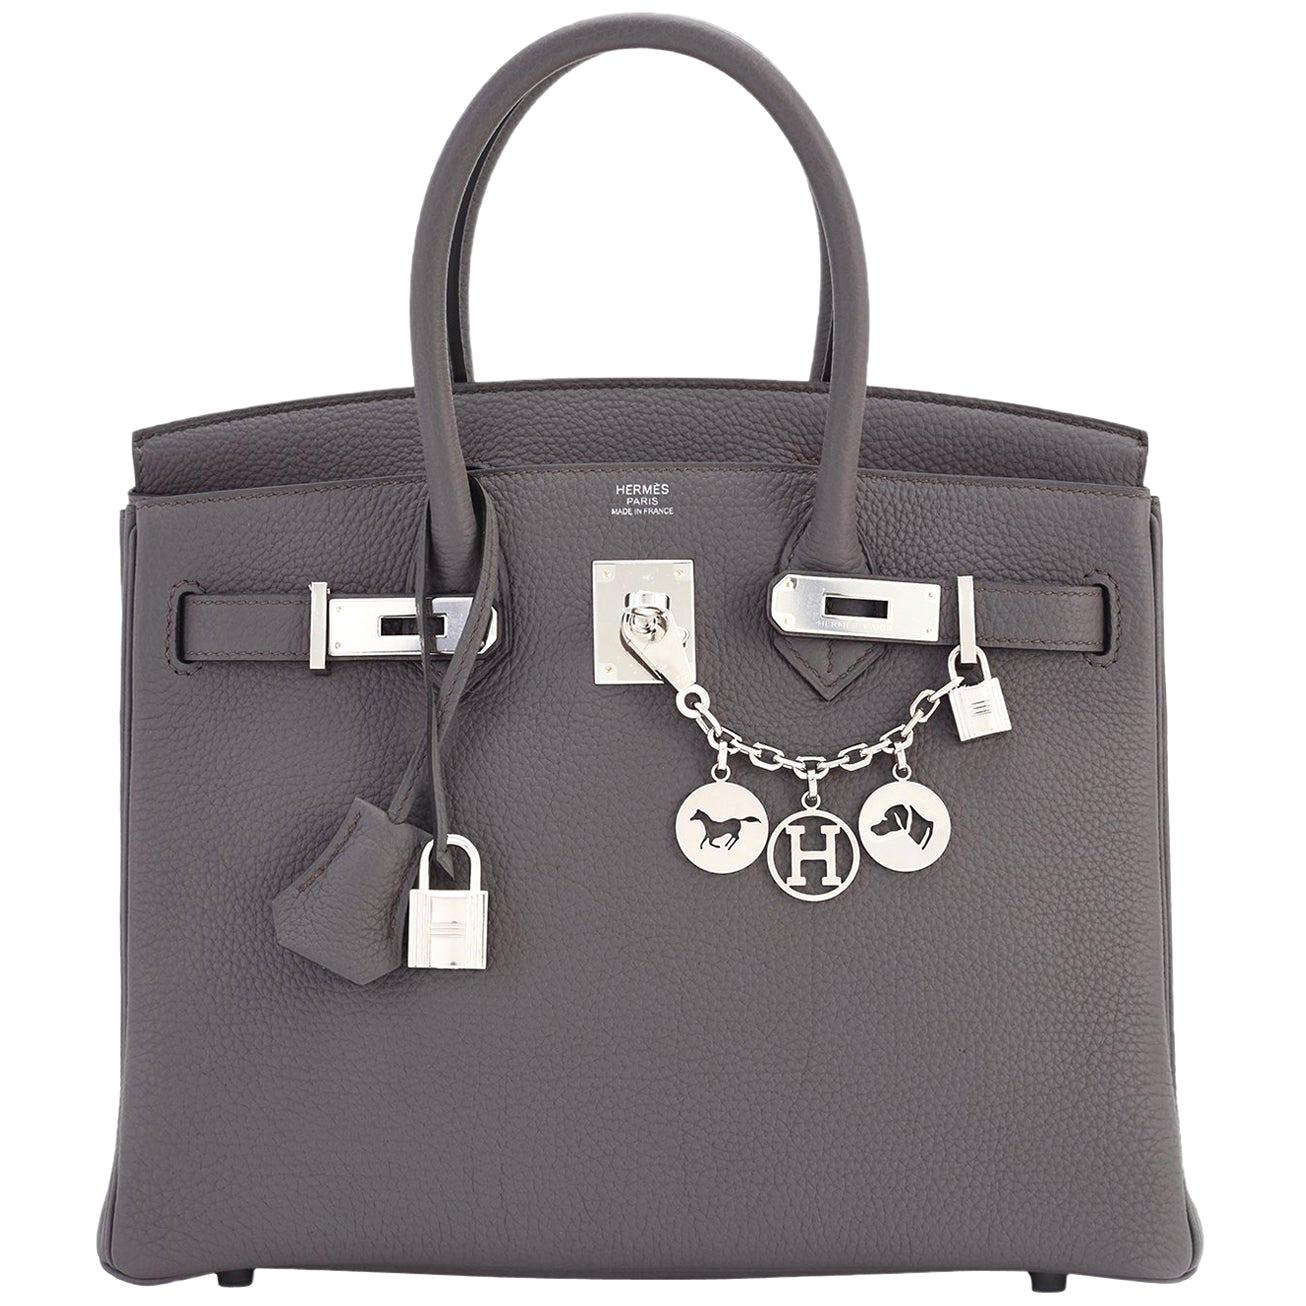 Hermes Birkin 30cm Etain Tin Grey Togo Palladium Hardware NEW